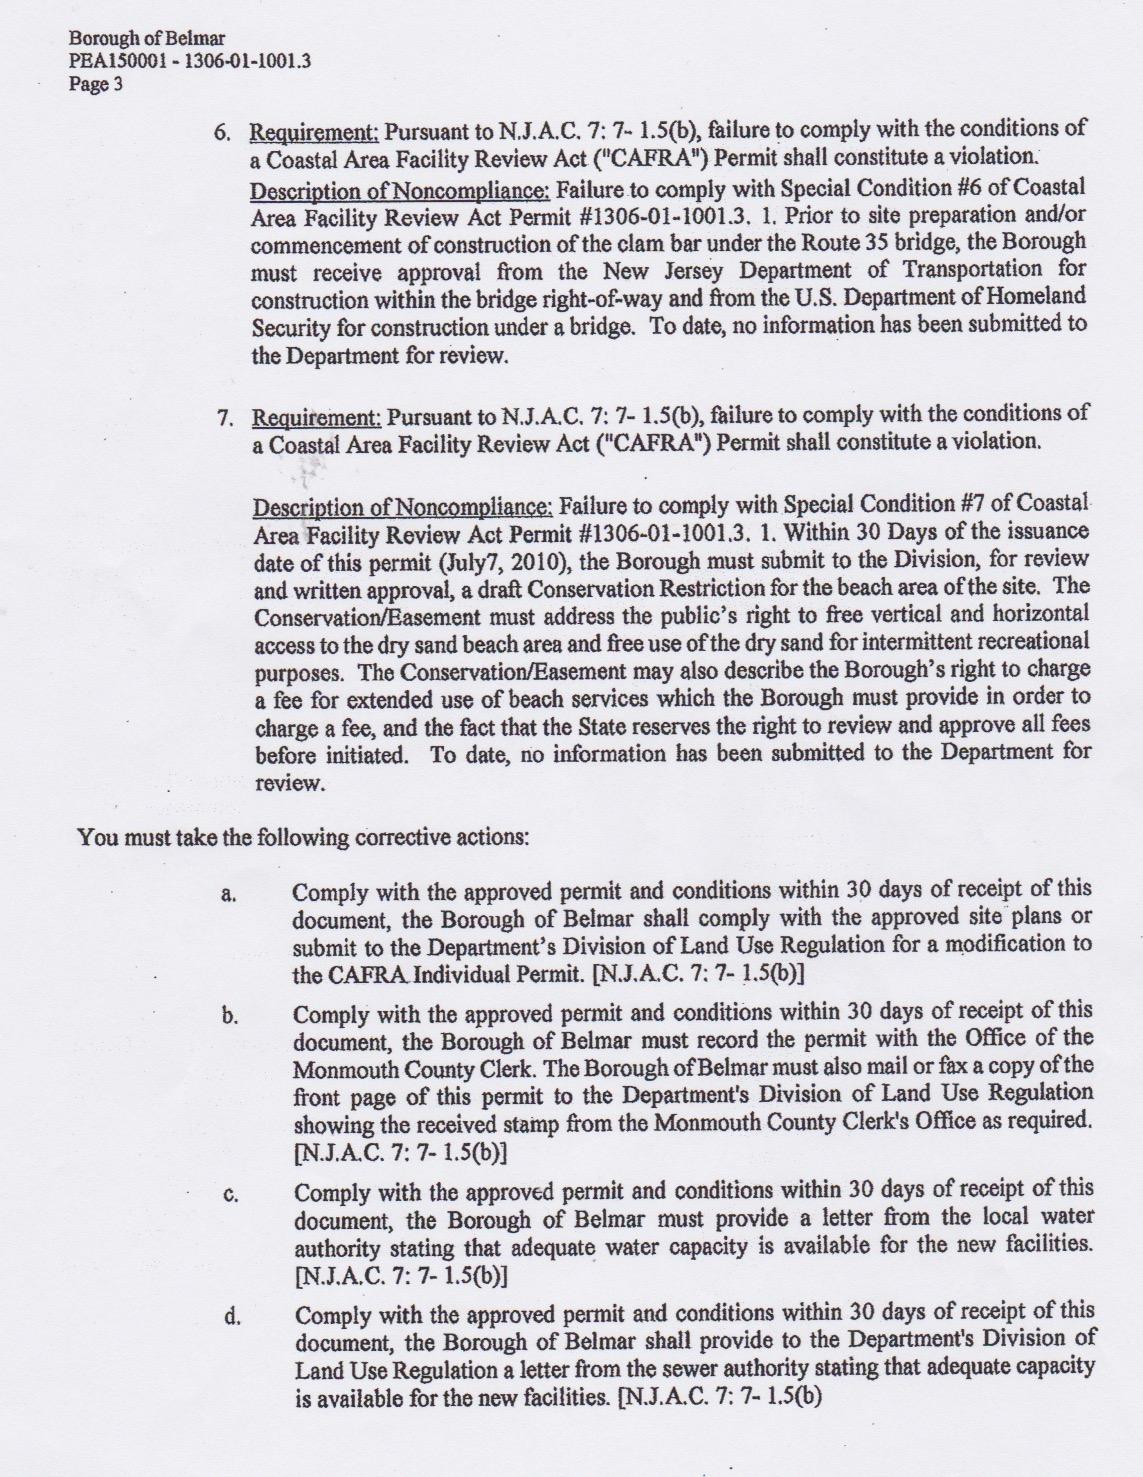 cafra violation notice 3